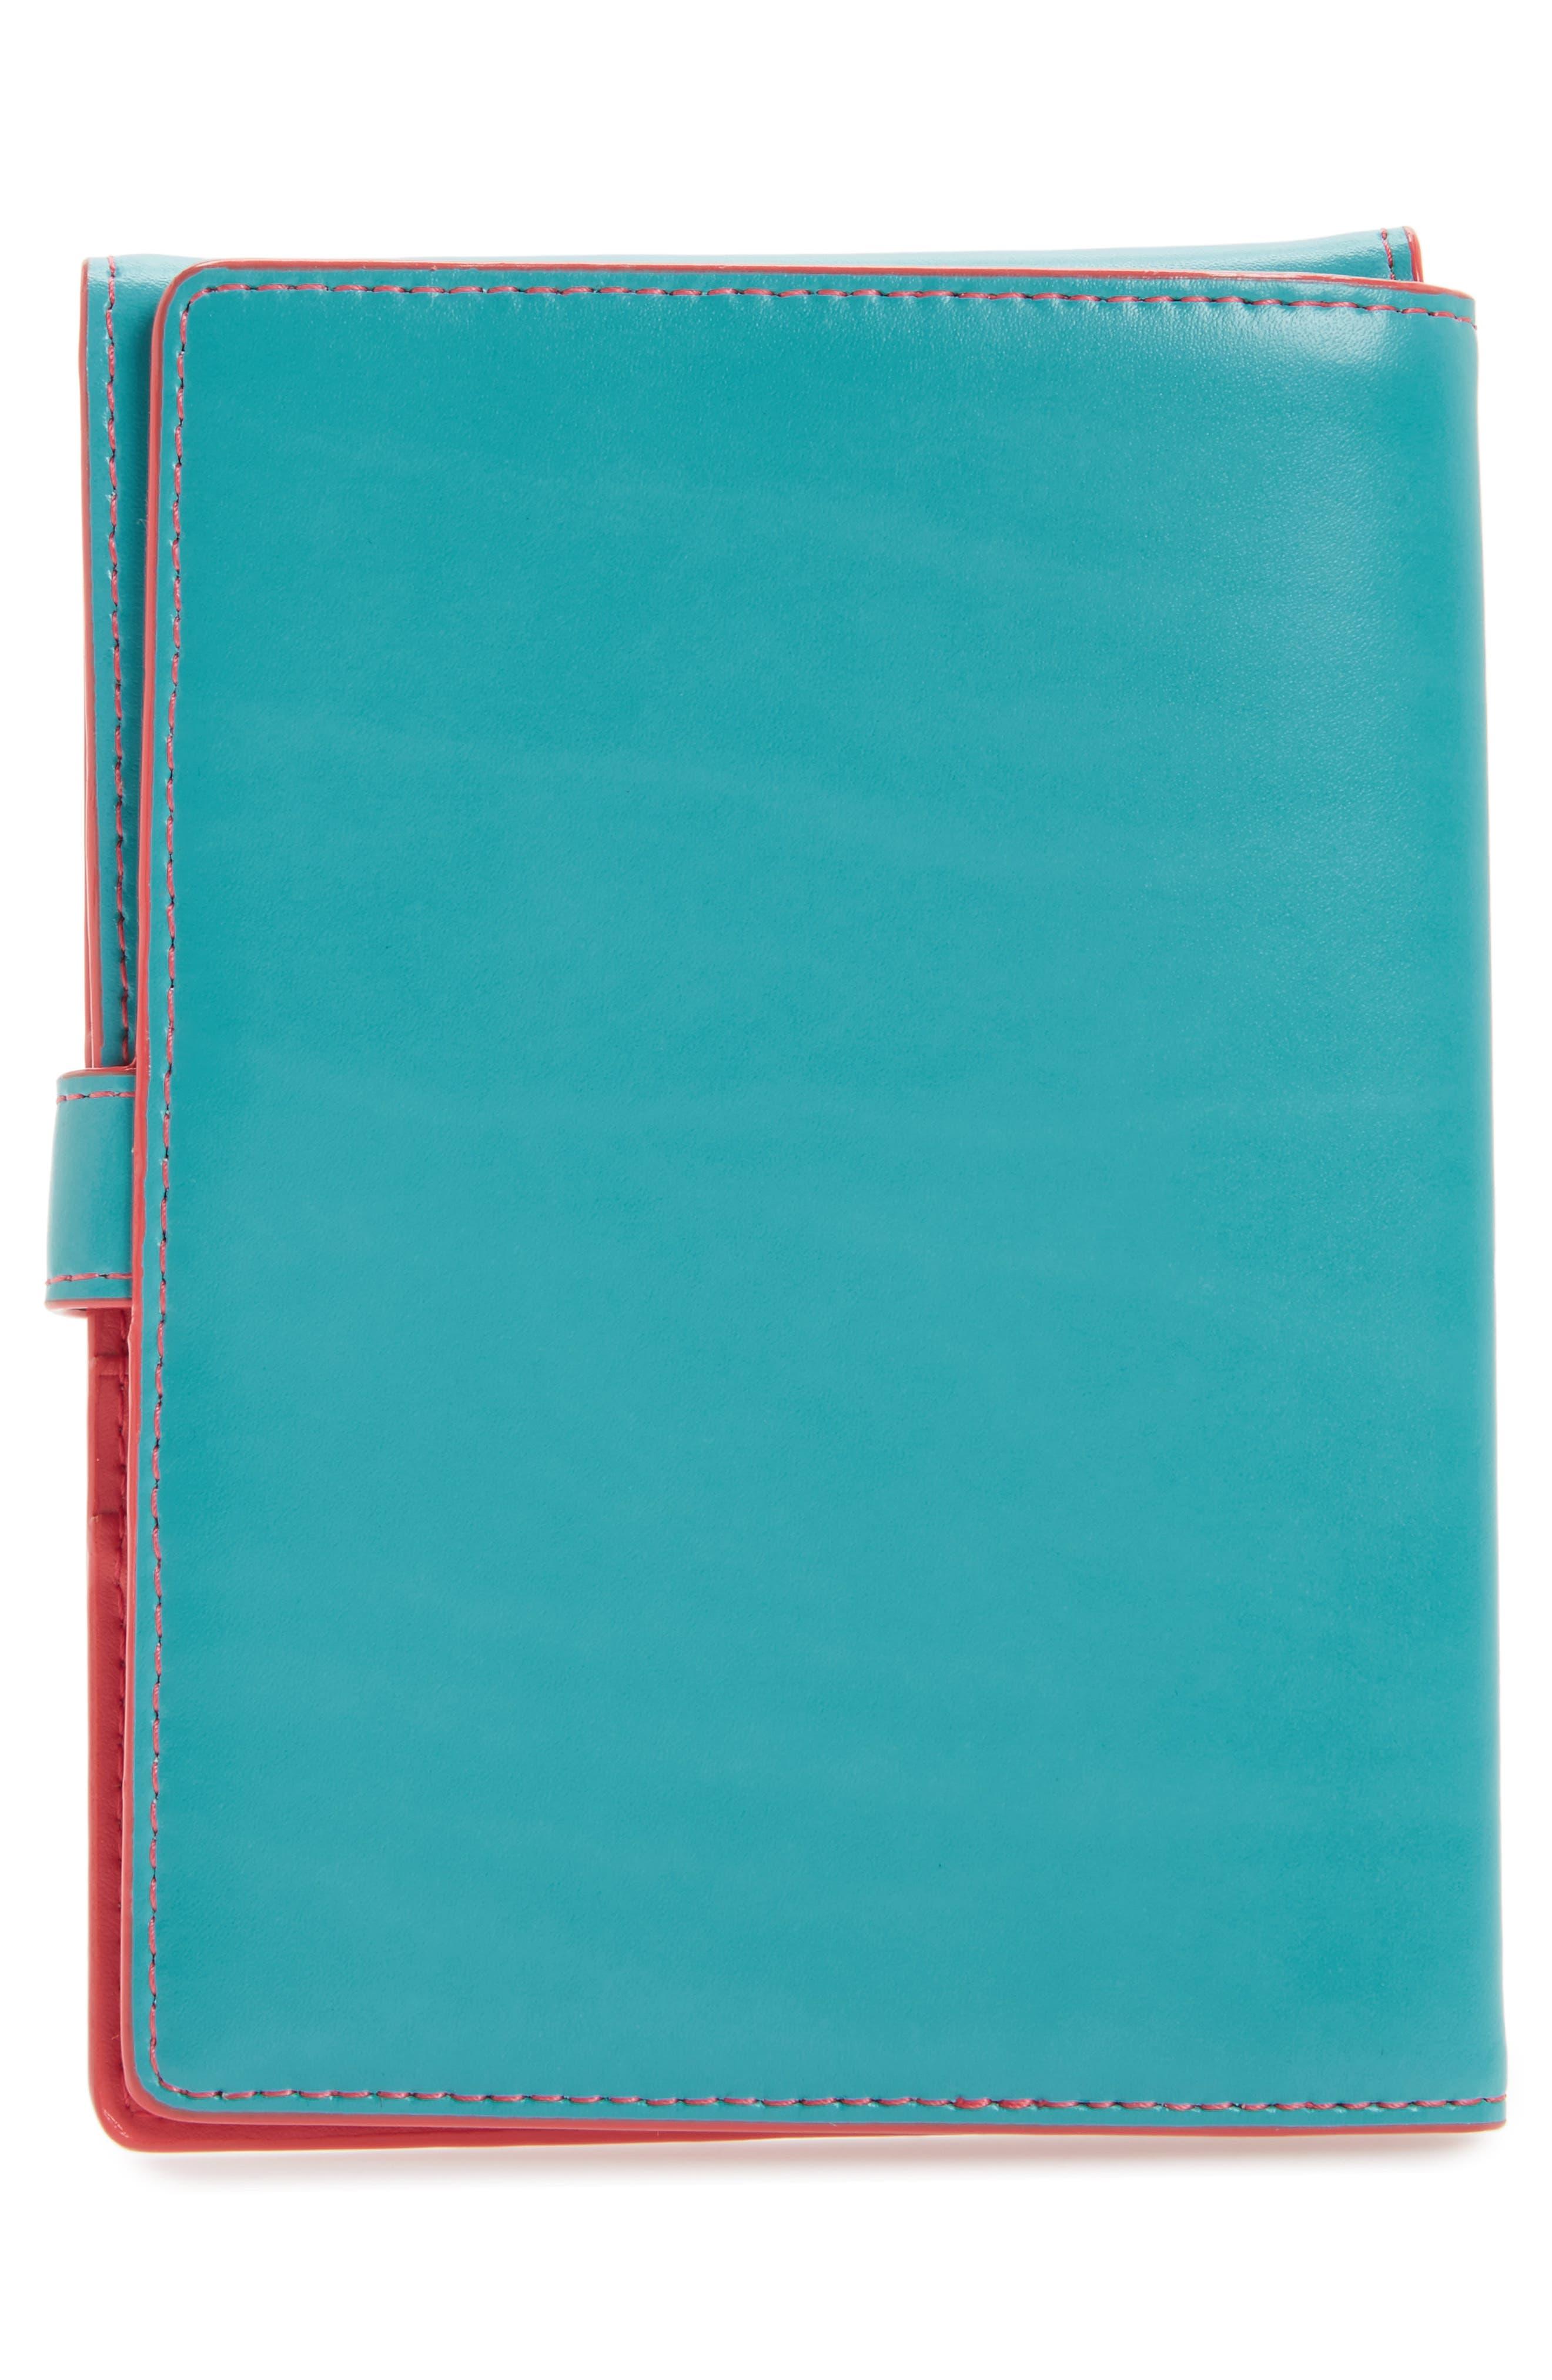 Audrey RFID Leather Passport Wallet,                             Alternate thumbnail 25, color,